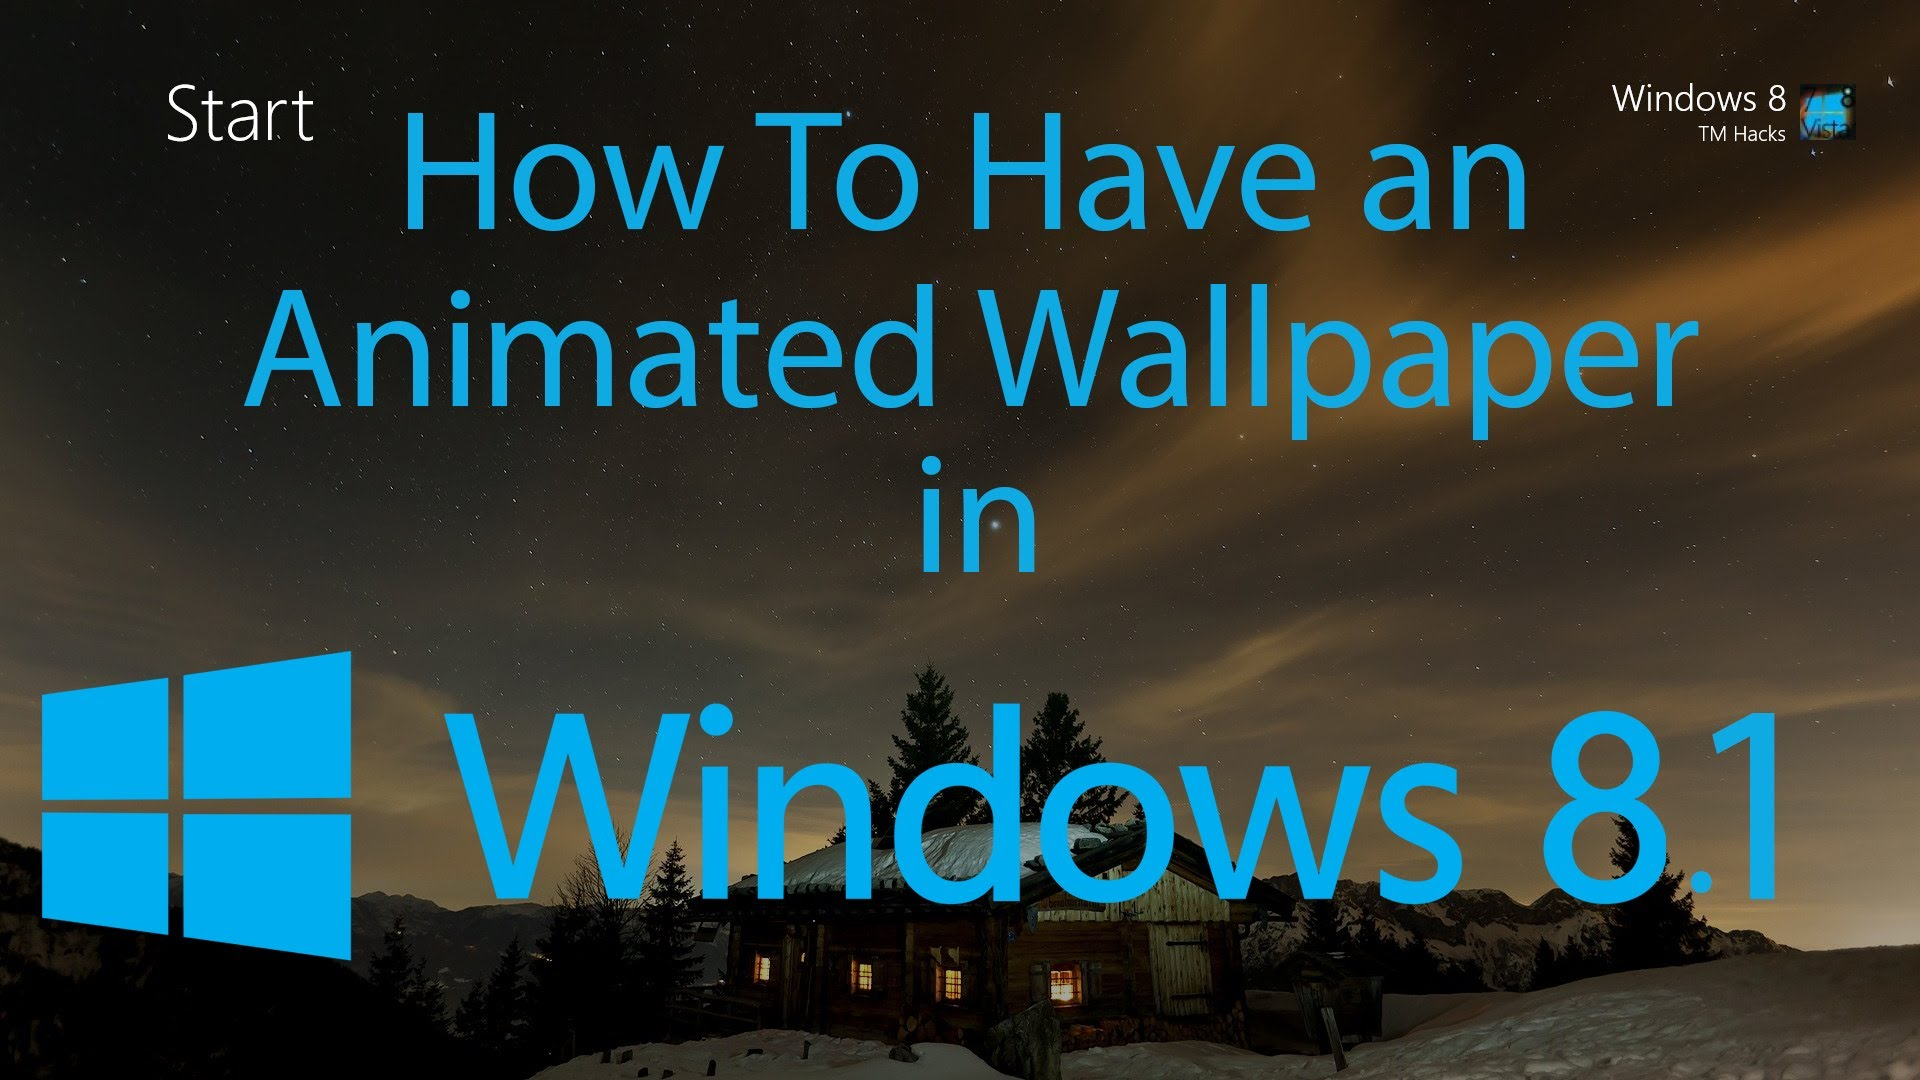 Hd-Live-For-Laptop-Windows-wallpaper-wpc9005913